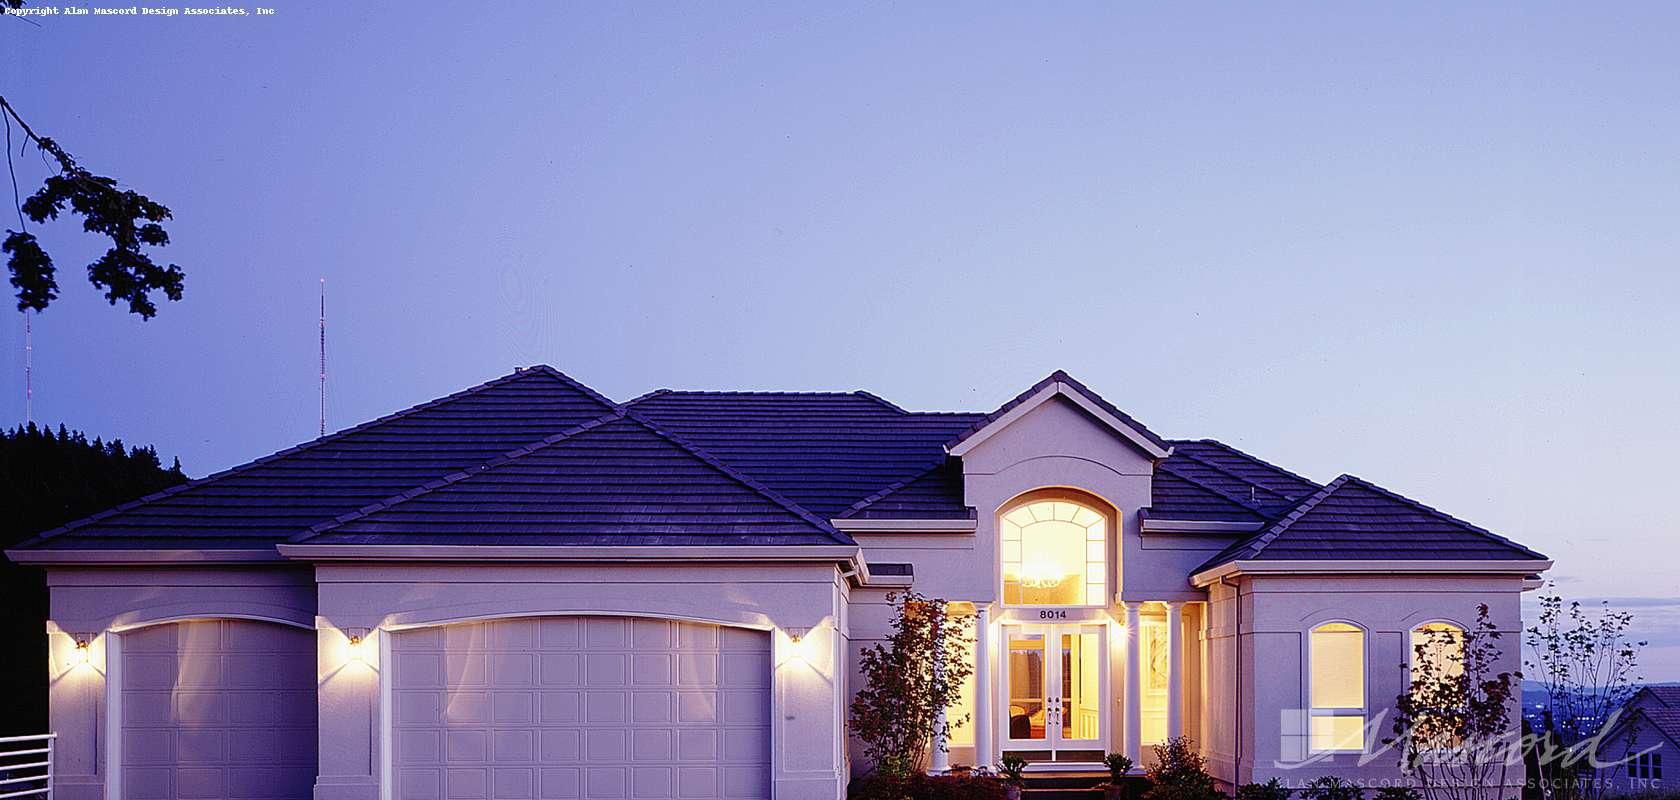 Mascord House Plan 1305: The Carenco